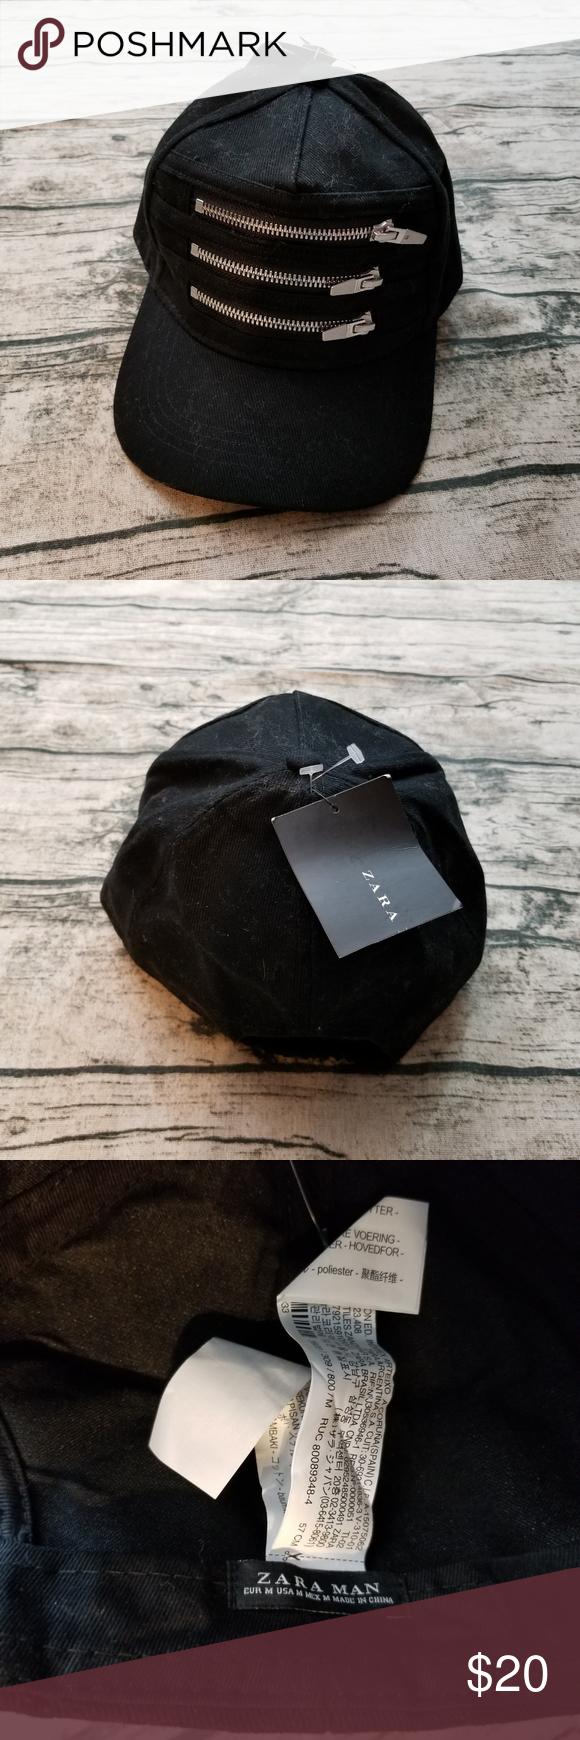 Nwt Zara Man Black Denim Hat W Zippers Zara Denim Hat Zara Man